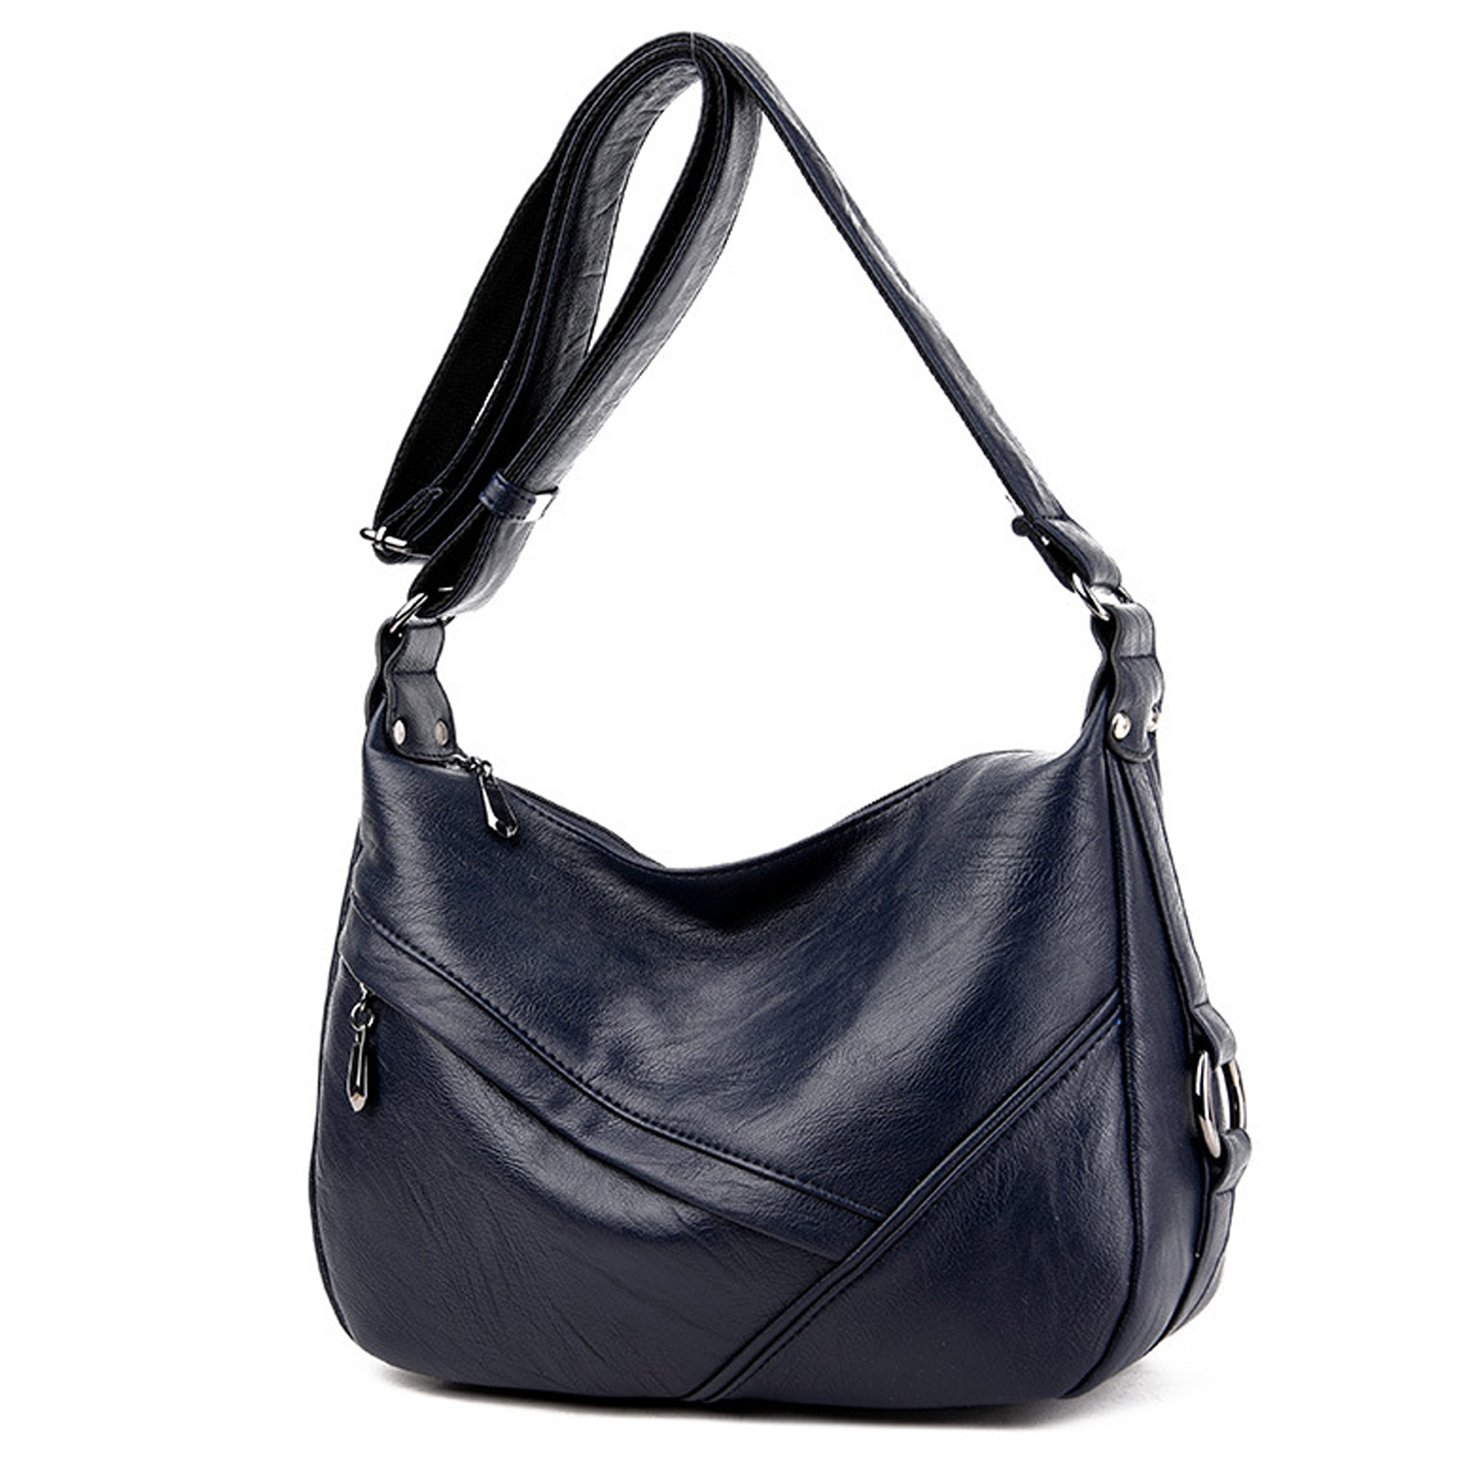 Lustear Ladies Soft Leather Shoulder Bags Hobo Style Bag (Dark Blue)